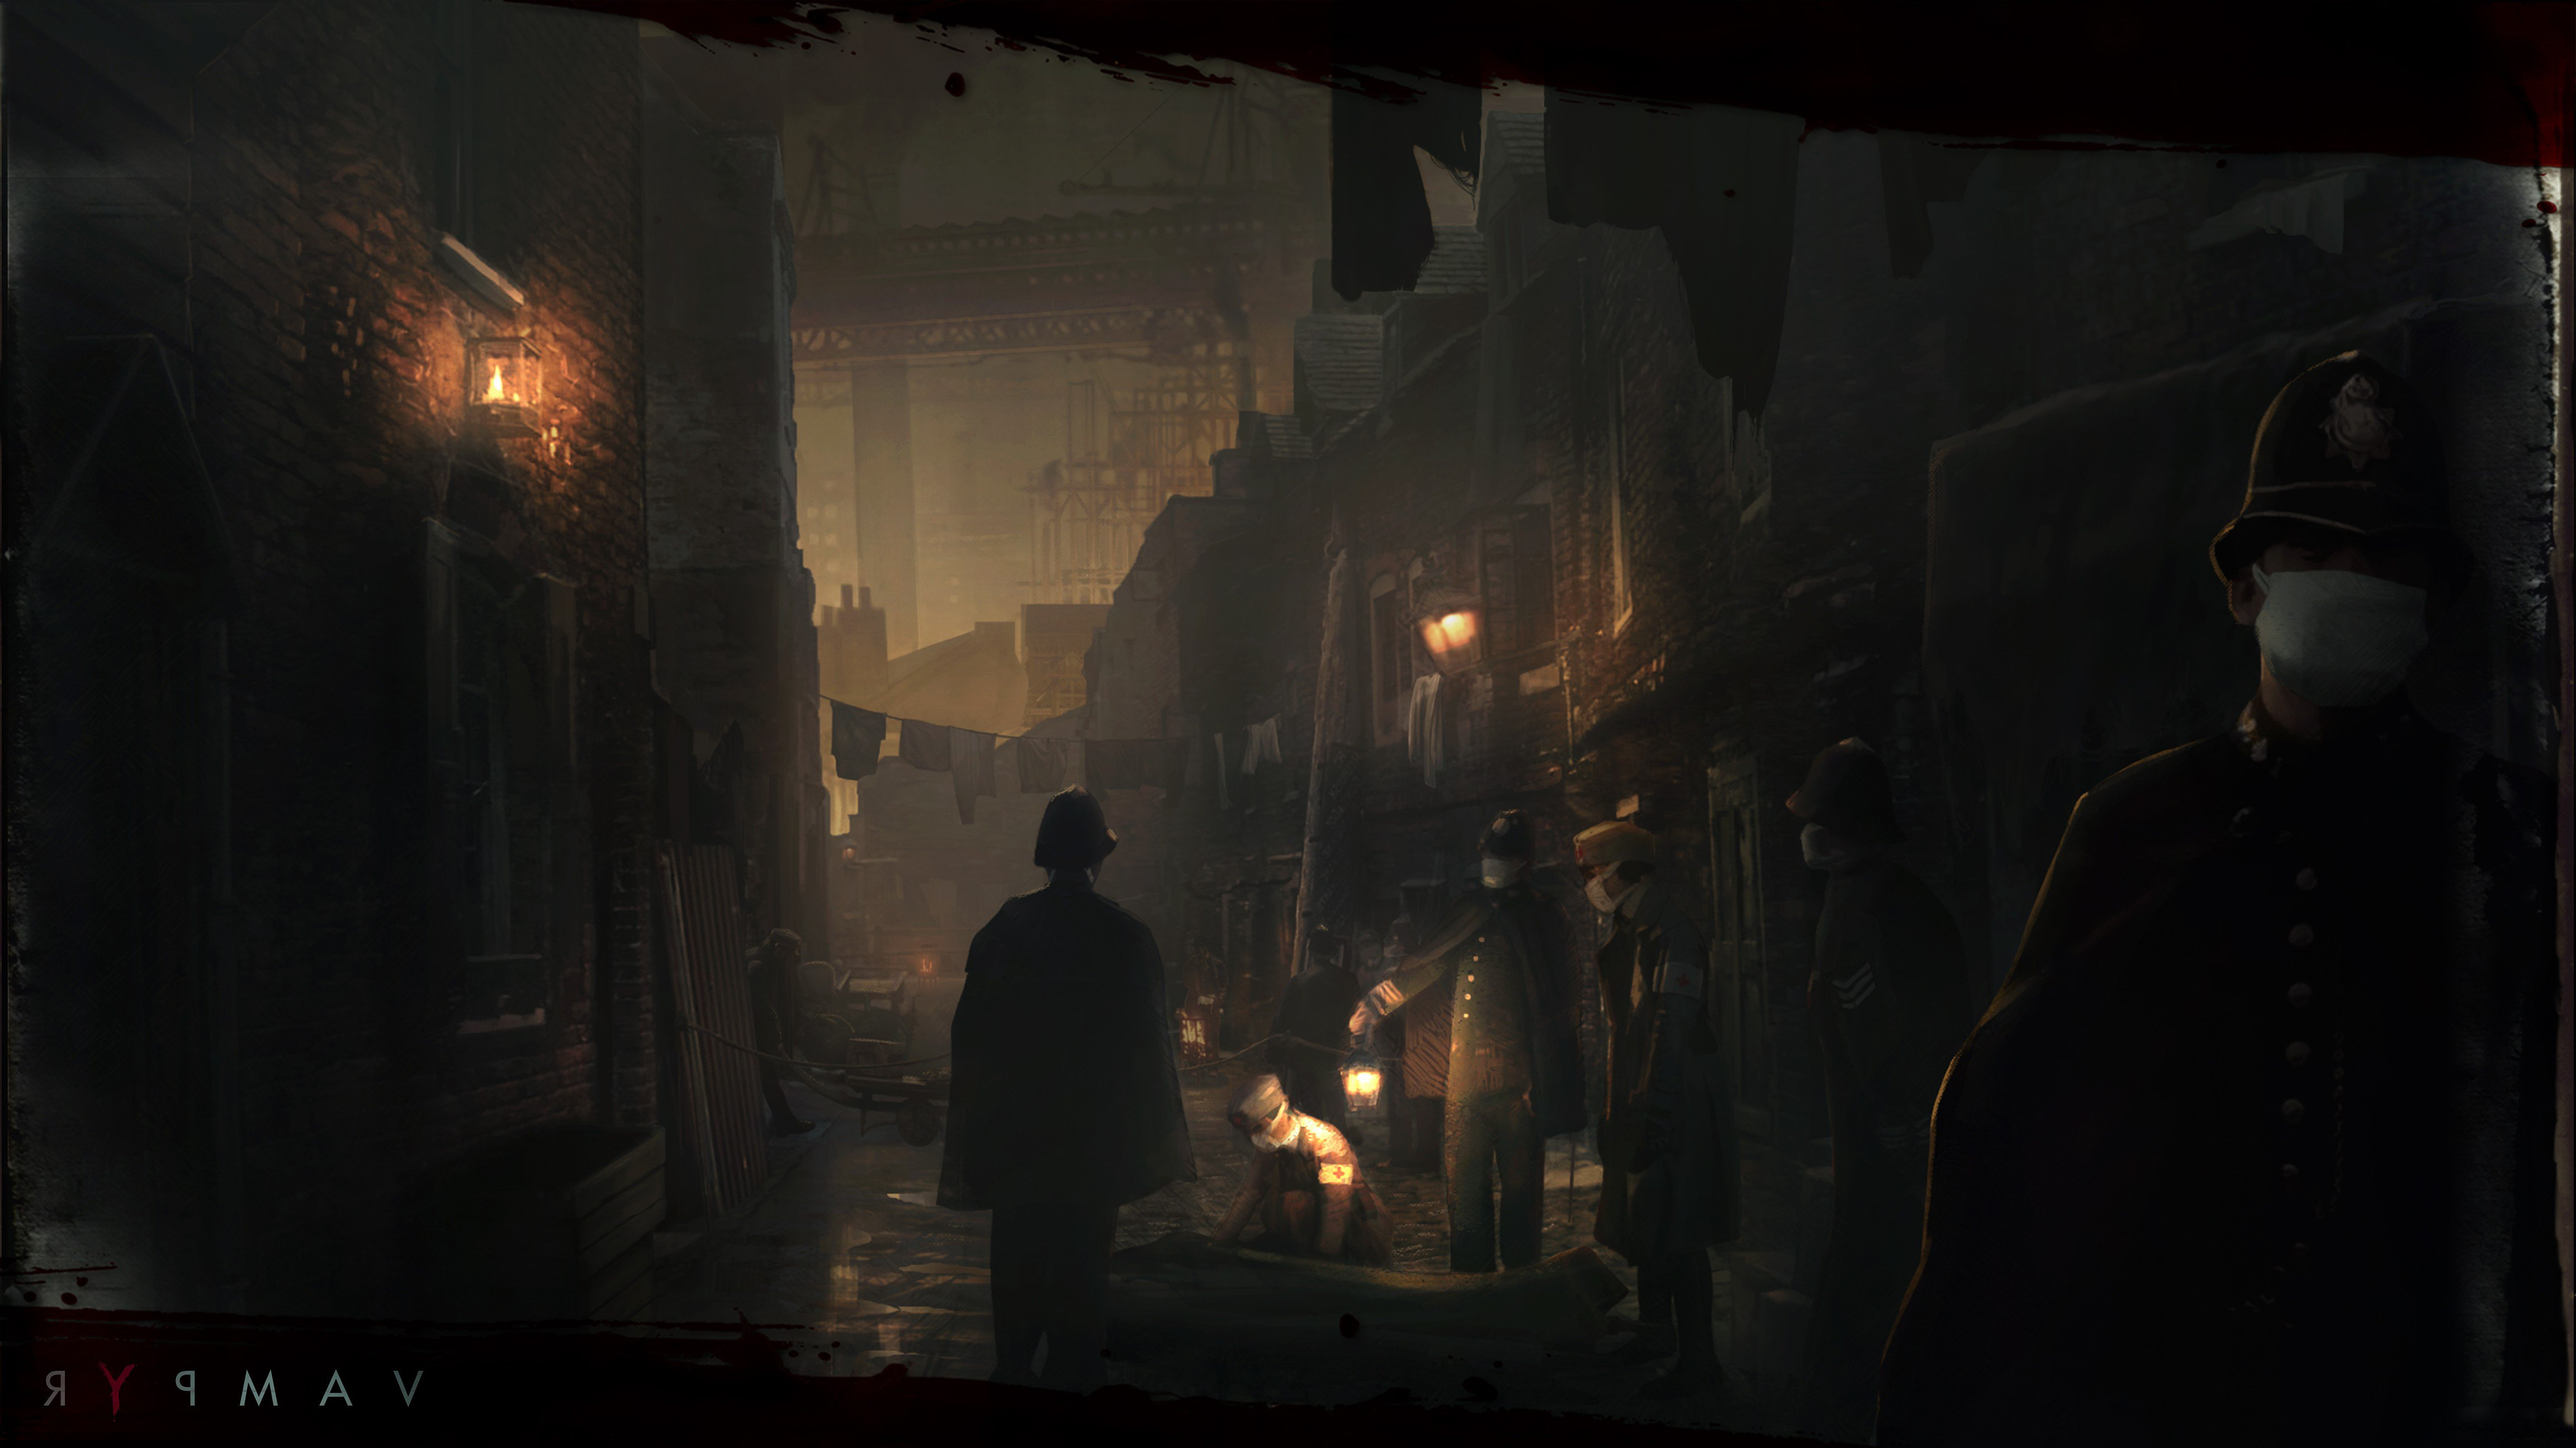 2048x1152 2017 Vampyr Video Game 2048x1152 Resolution HD ...